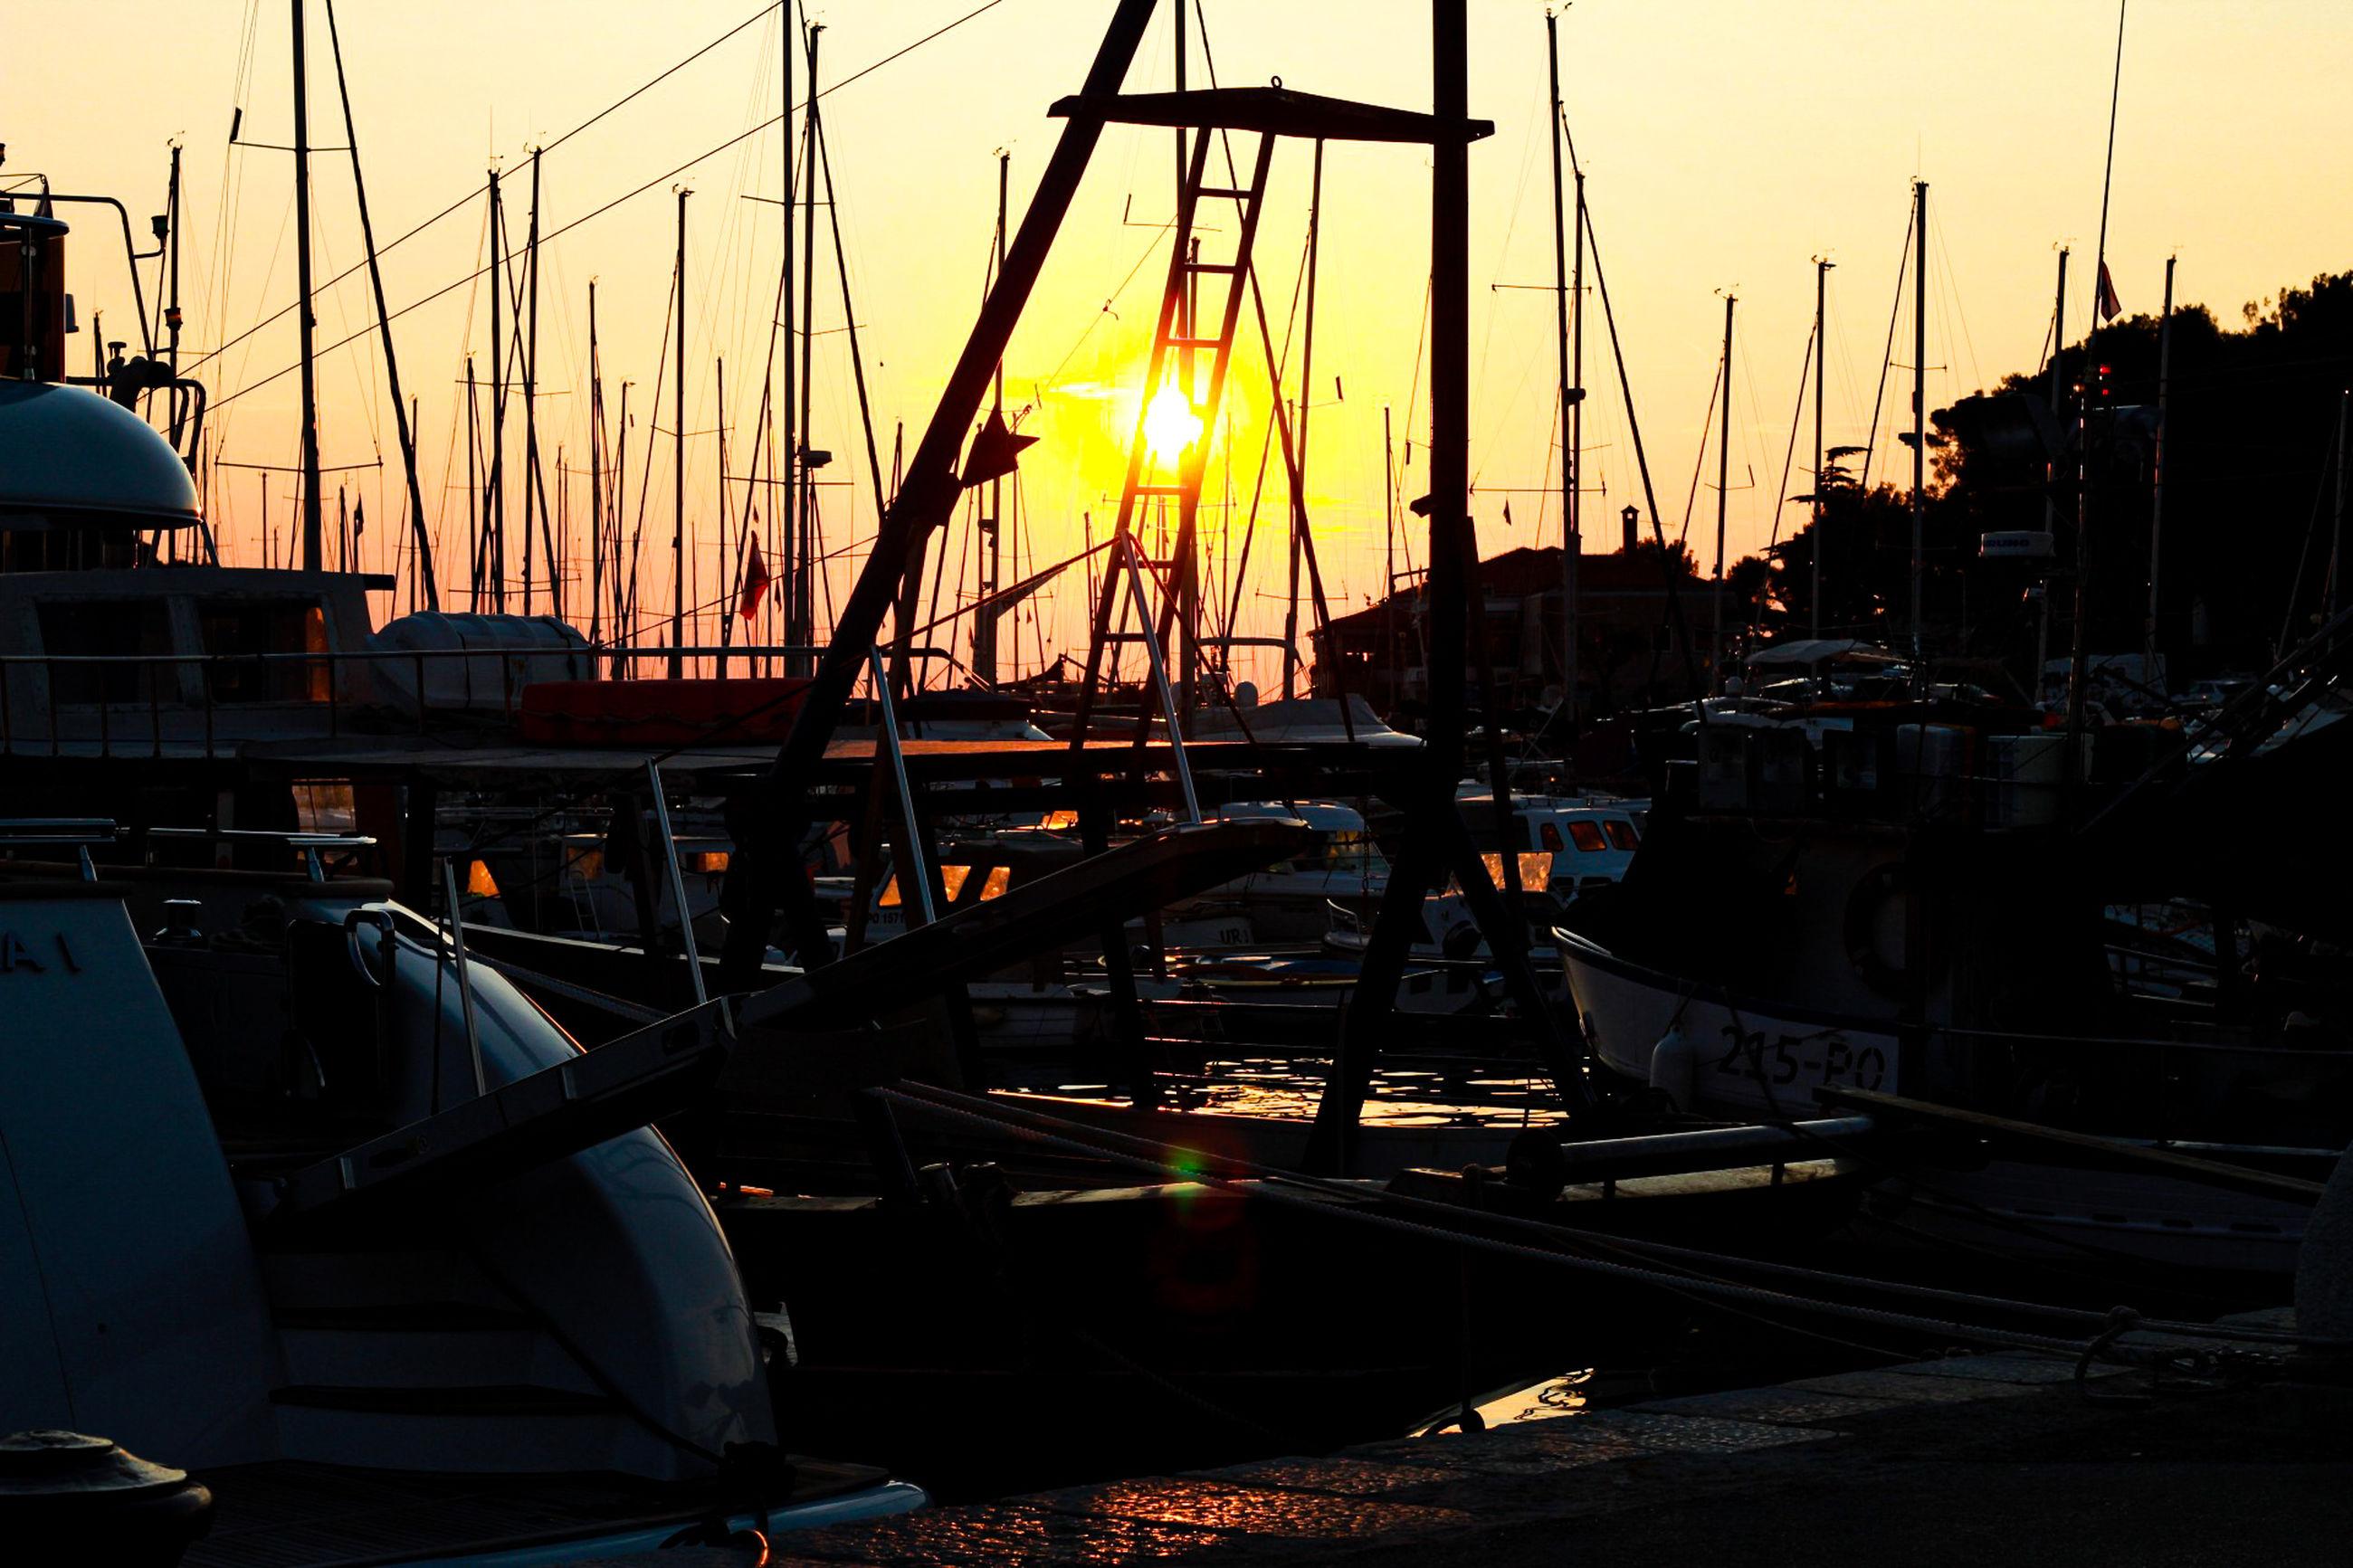 nautical vessel, sunset, transportation, water, sky, mode of transportation, sailboat, harbor, mast, moored, nature, architecture, pole, sun, no people, orange color, silhouette, sunlight, built structure, outdoors, yacht, marina, port